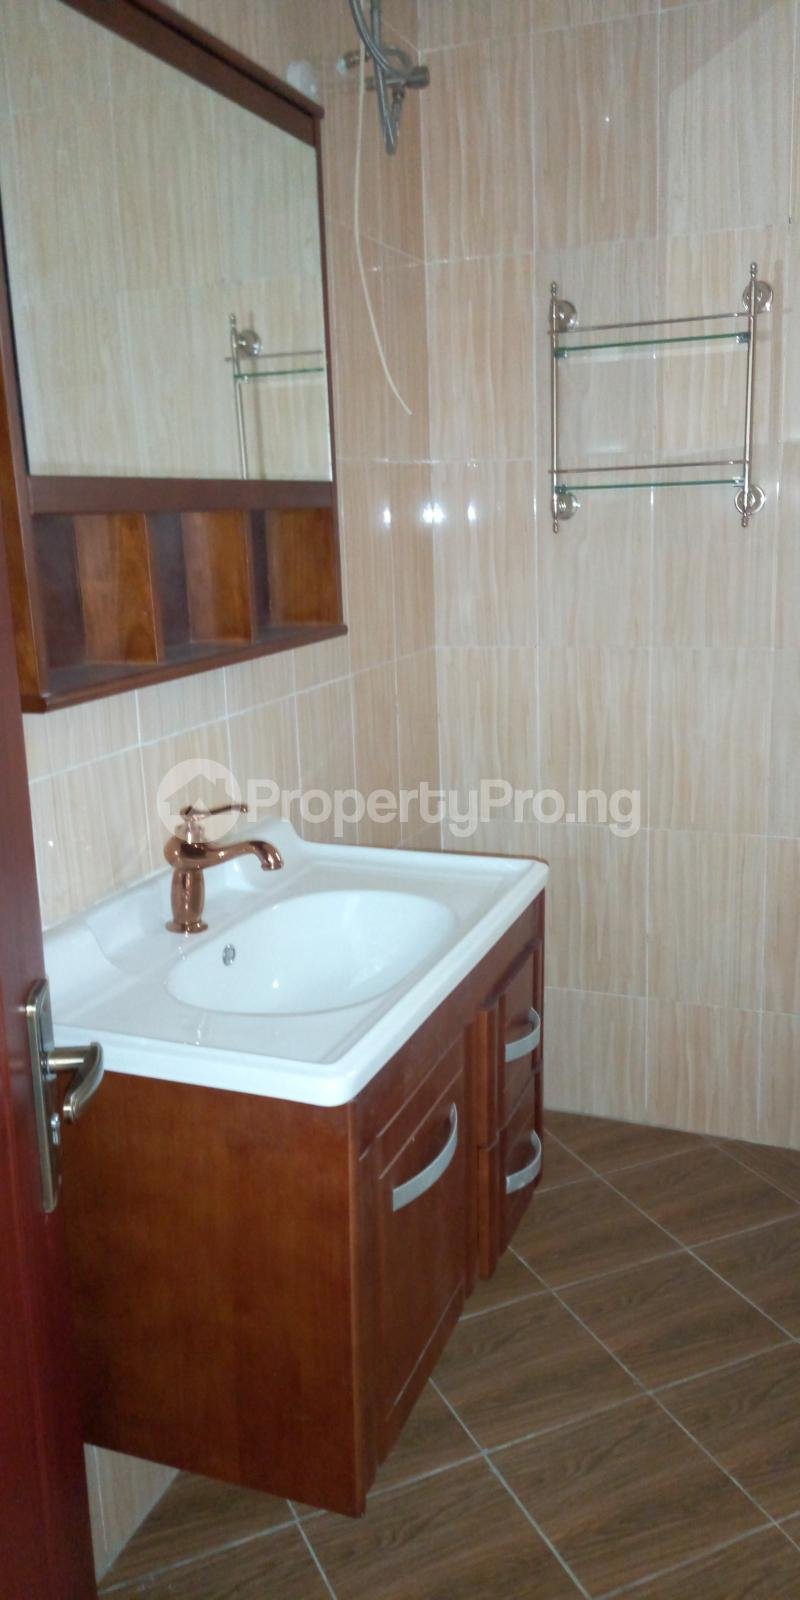 5 bedroom Detached Duplex House for rent Peace Gardens Estate Monastery road Sangotedo Lagos - 10